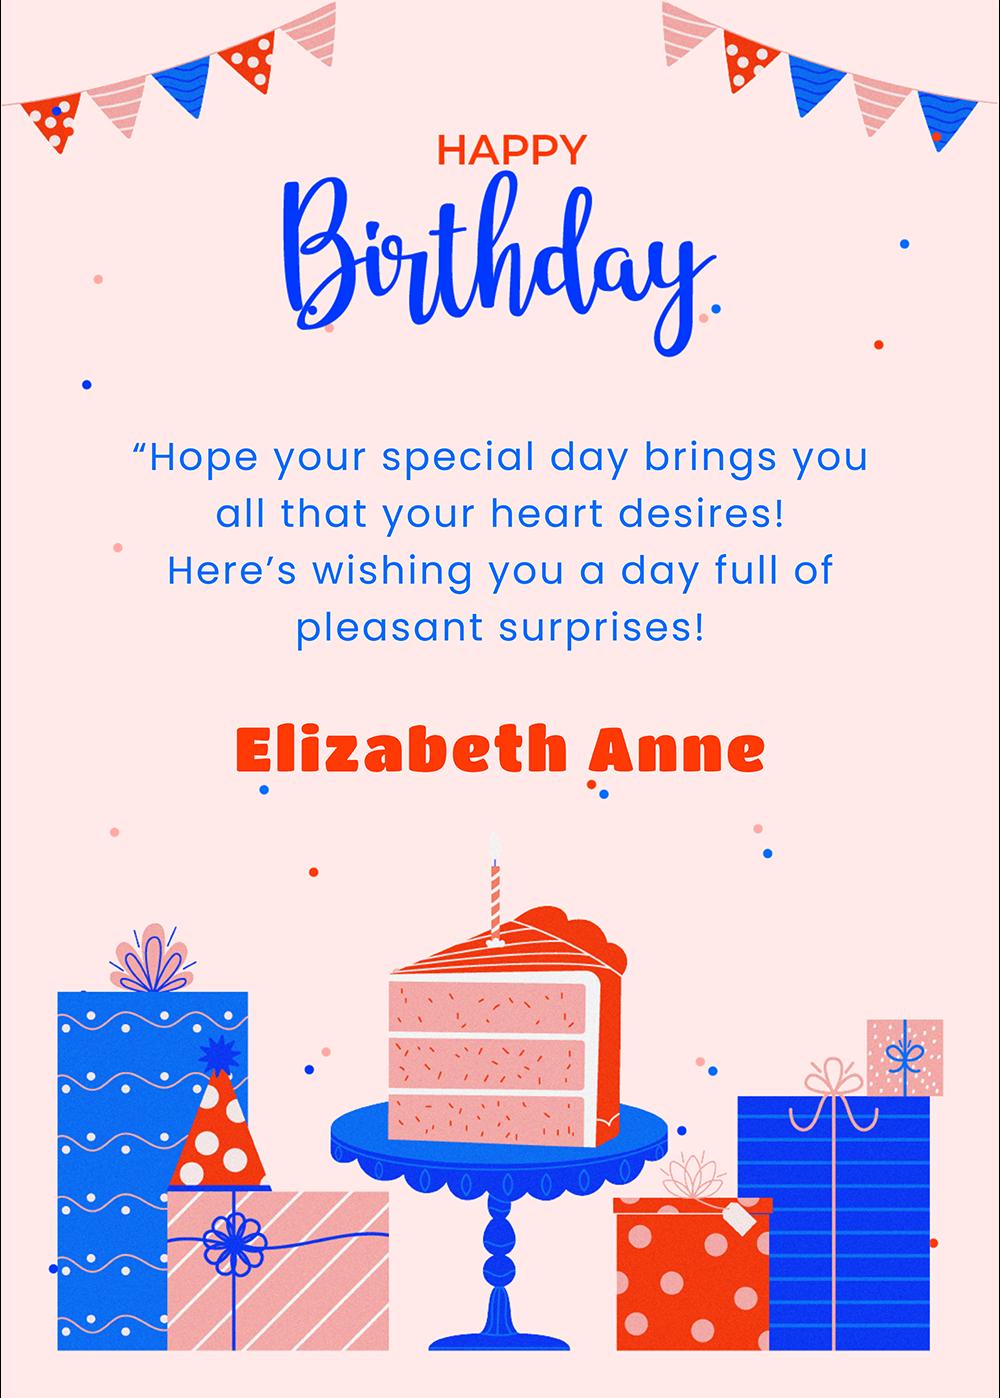 Cake & Gifts Greeting Card